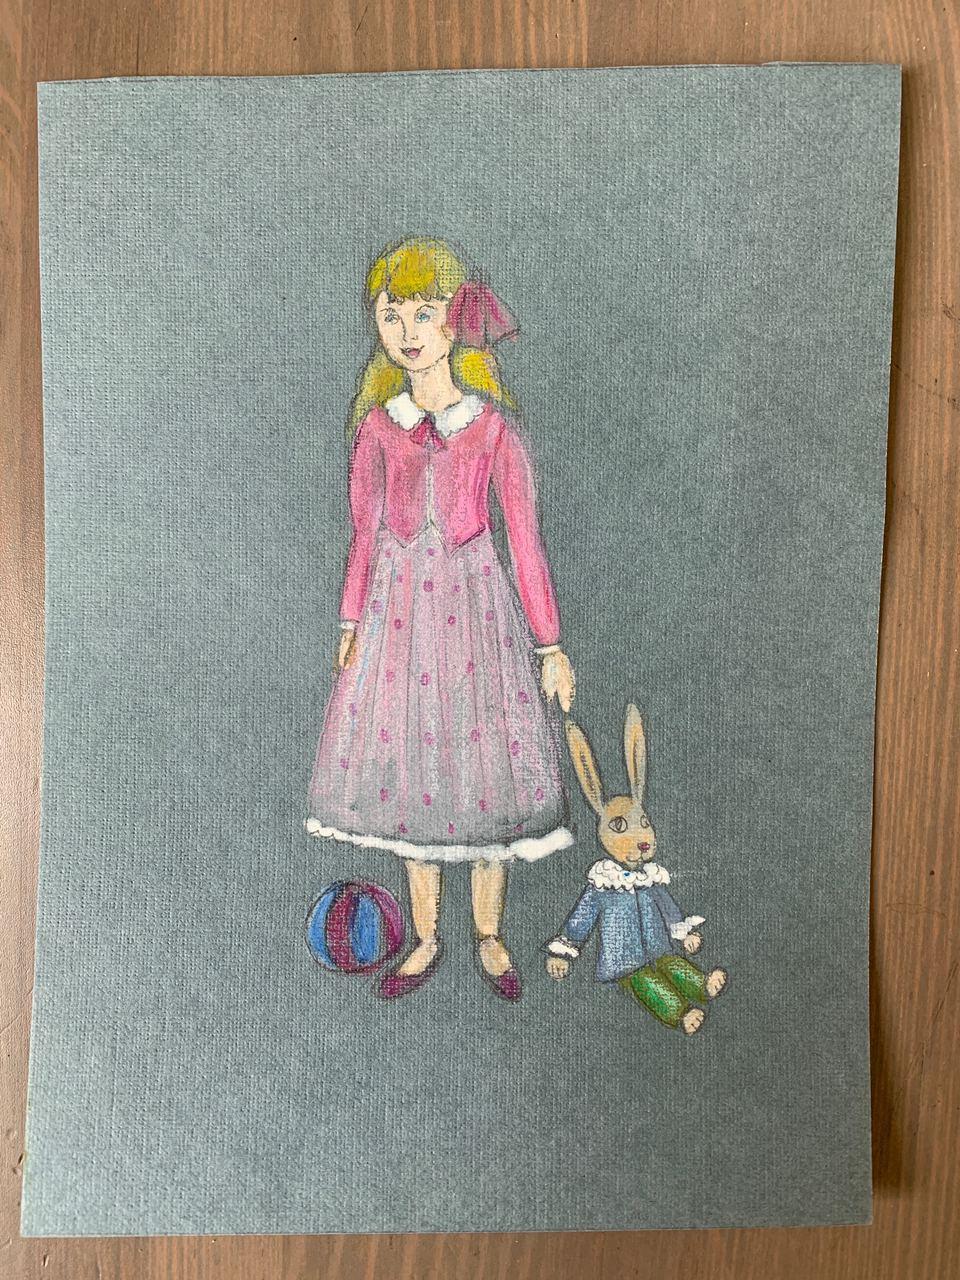 Lemberg Helen. Girl with a Rabbit